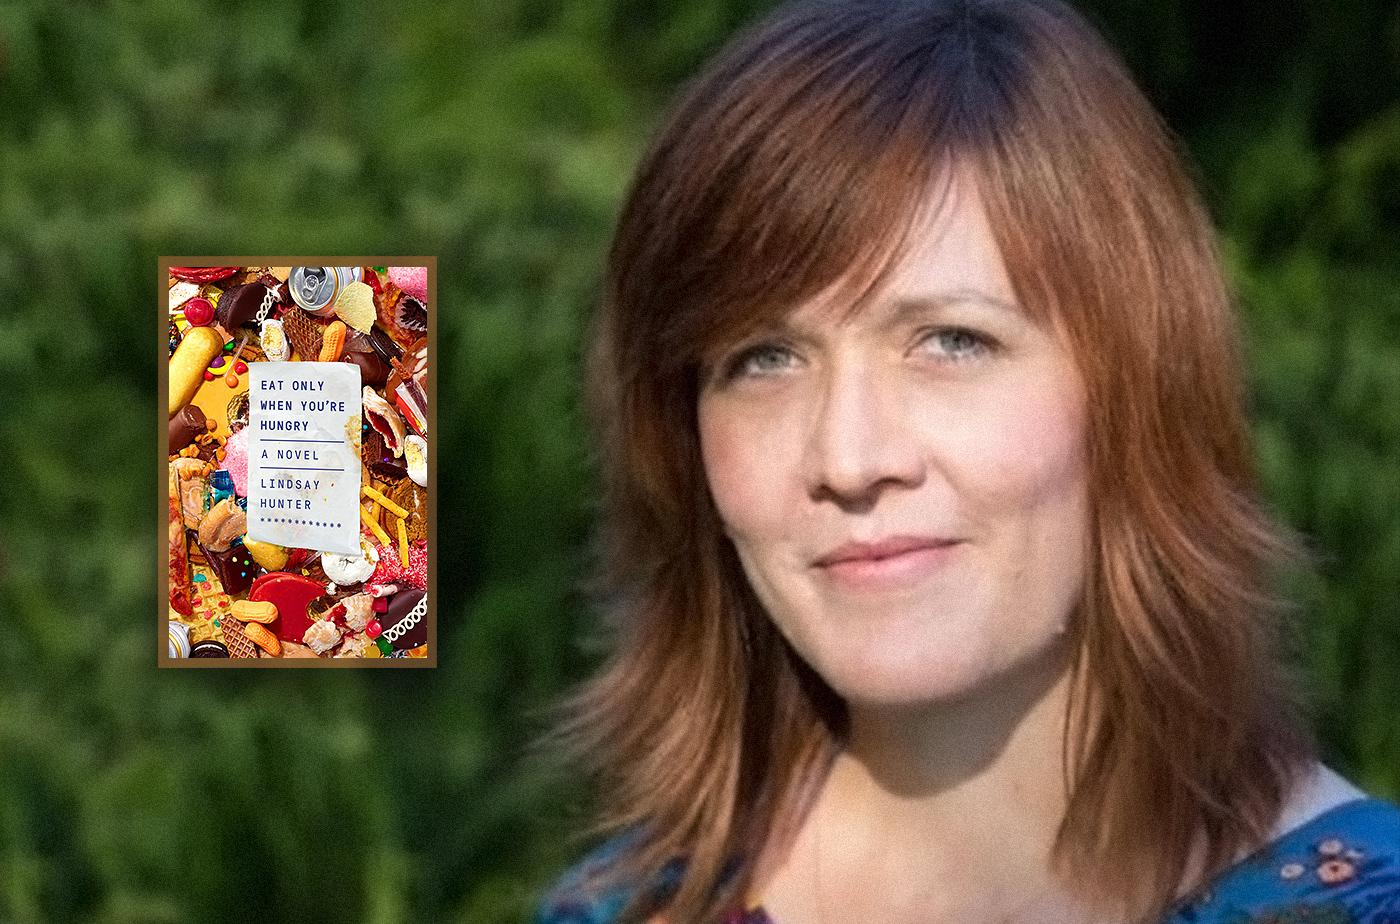 Catapult online classes: Lindsay Hunter, Online Generative Workshop: 6 Weeks, 5 Flash Fiction Pieces , Fiction, Workshop